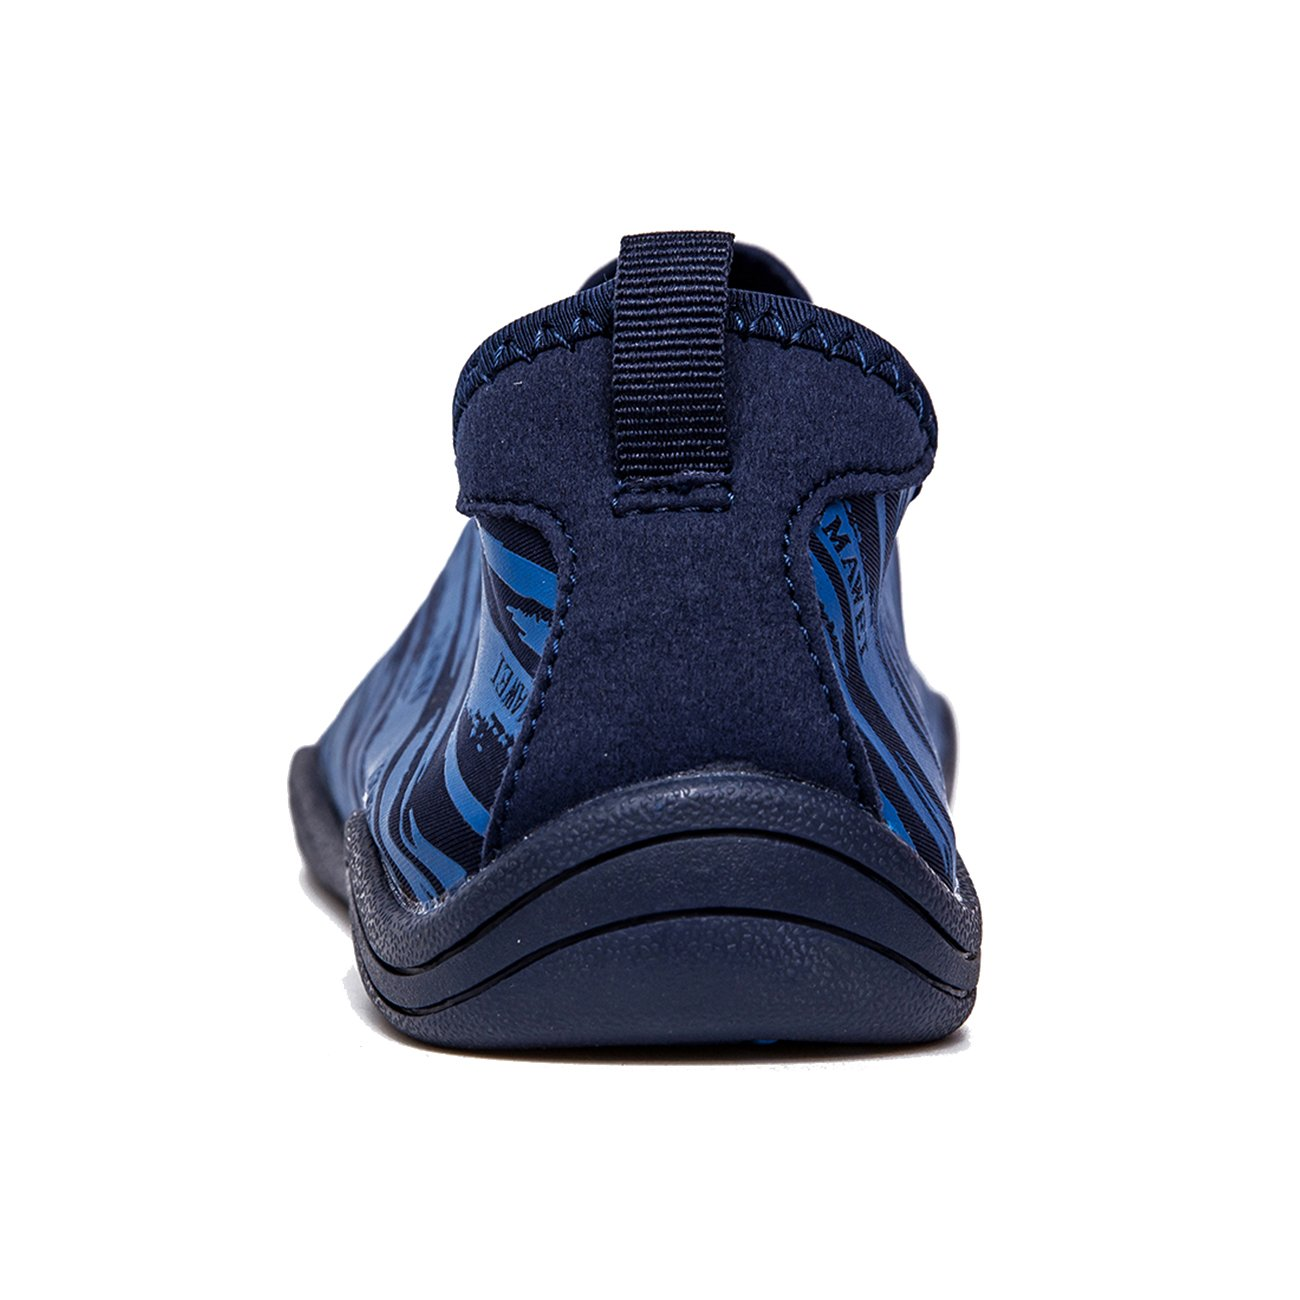 SUPERSHOES Men Women Water Shoes Quick Drying Aqua Swim Shoes Sneakers Walking Running Hiking Shoes (Women US 9.5, 03.Blue) by SUPERSHOES (Image #5)